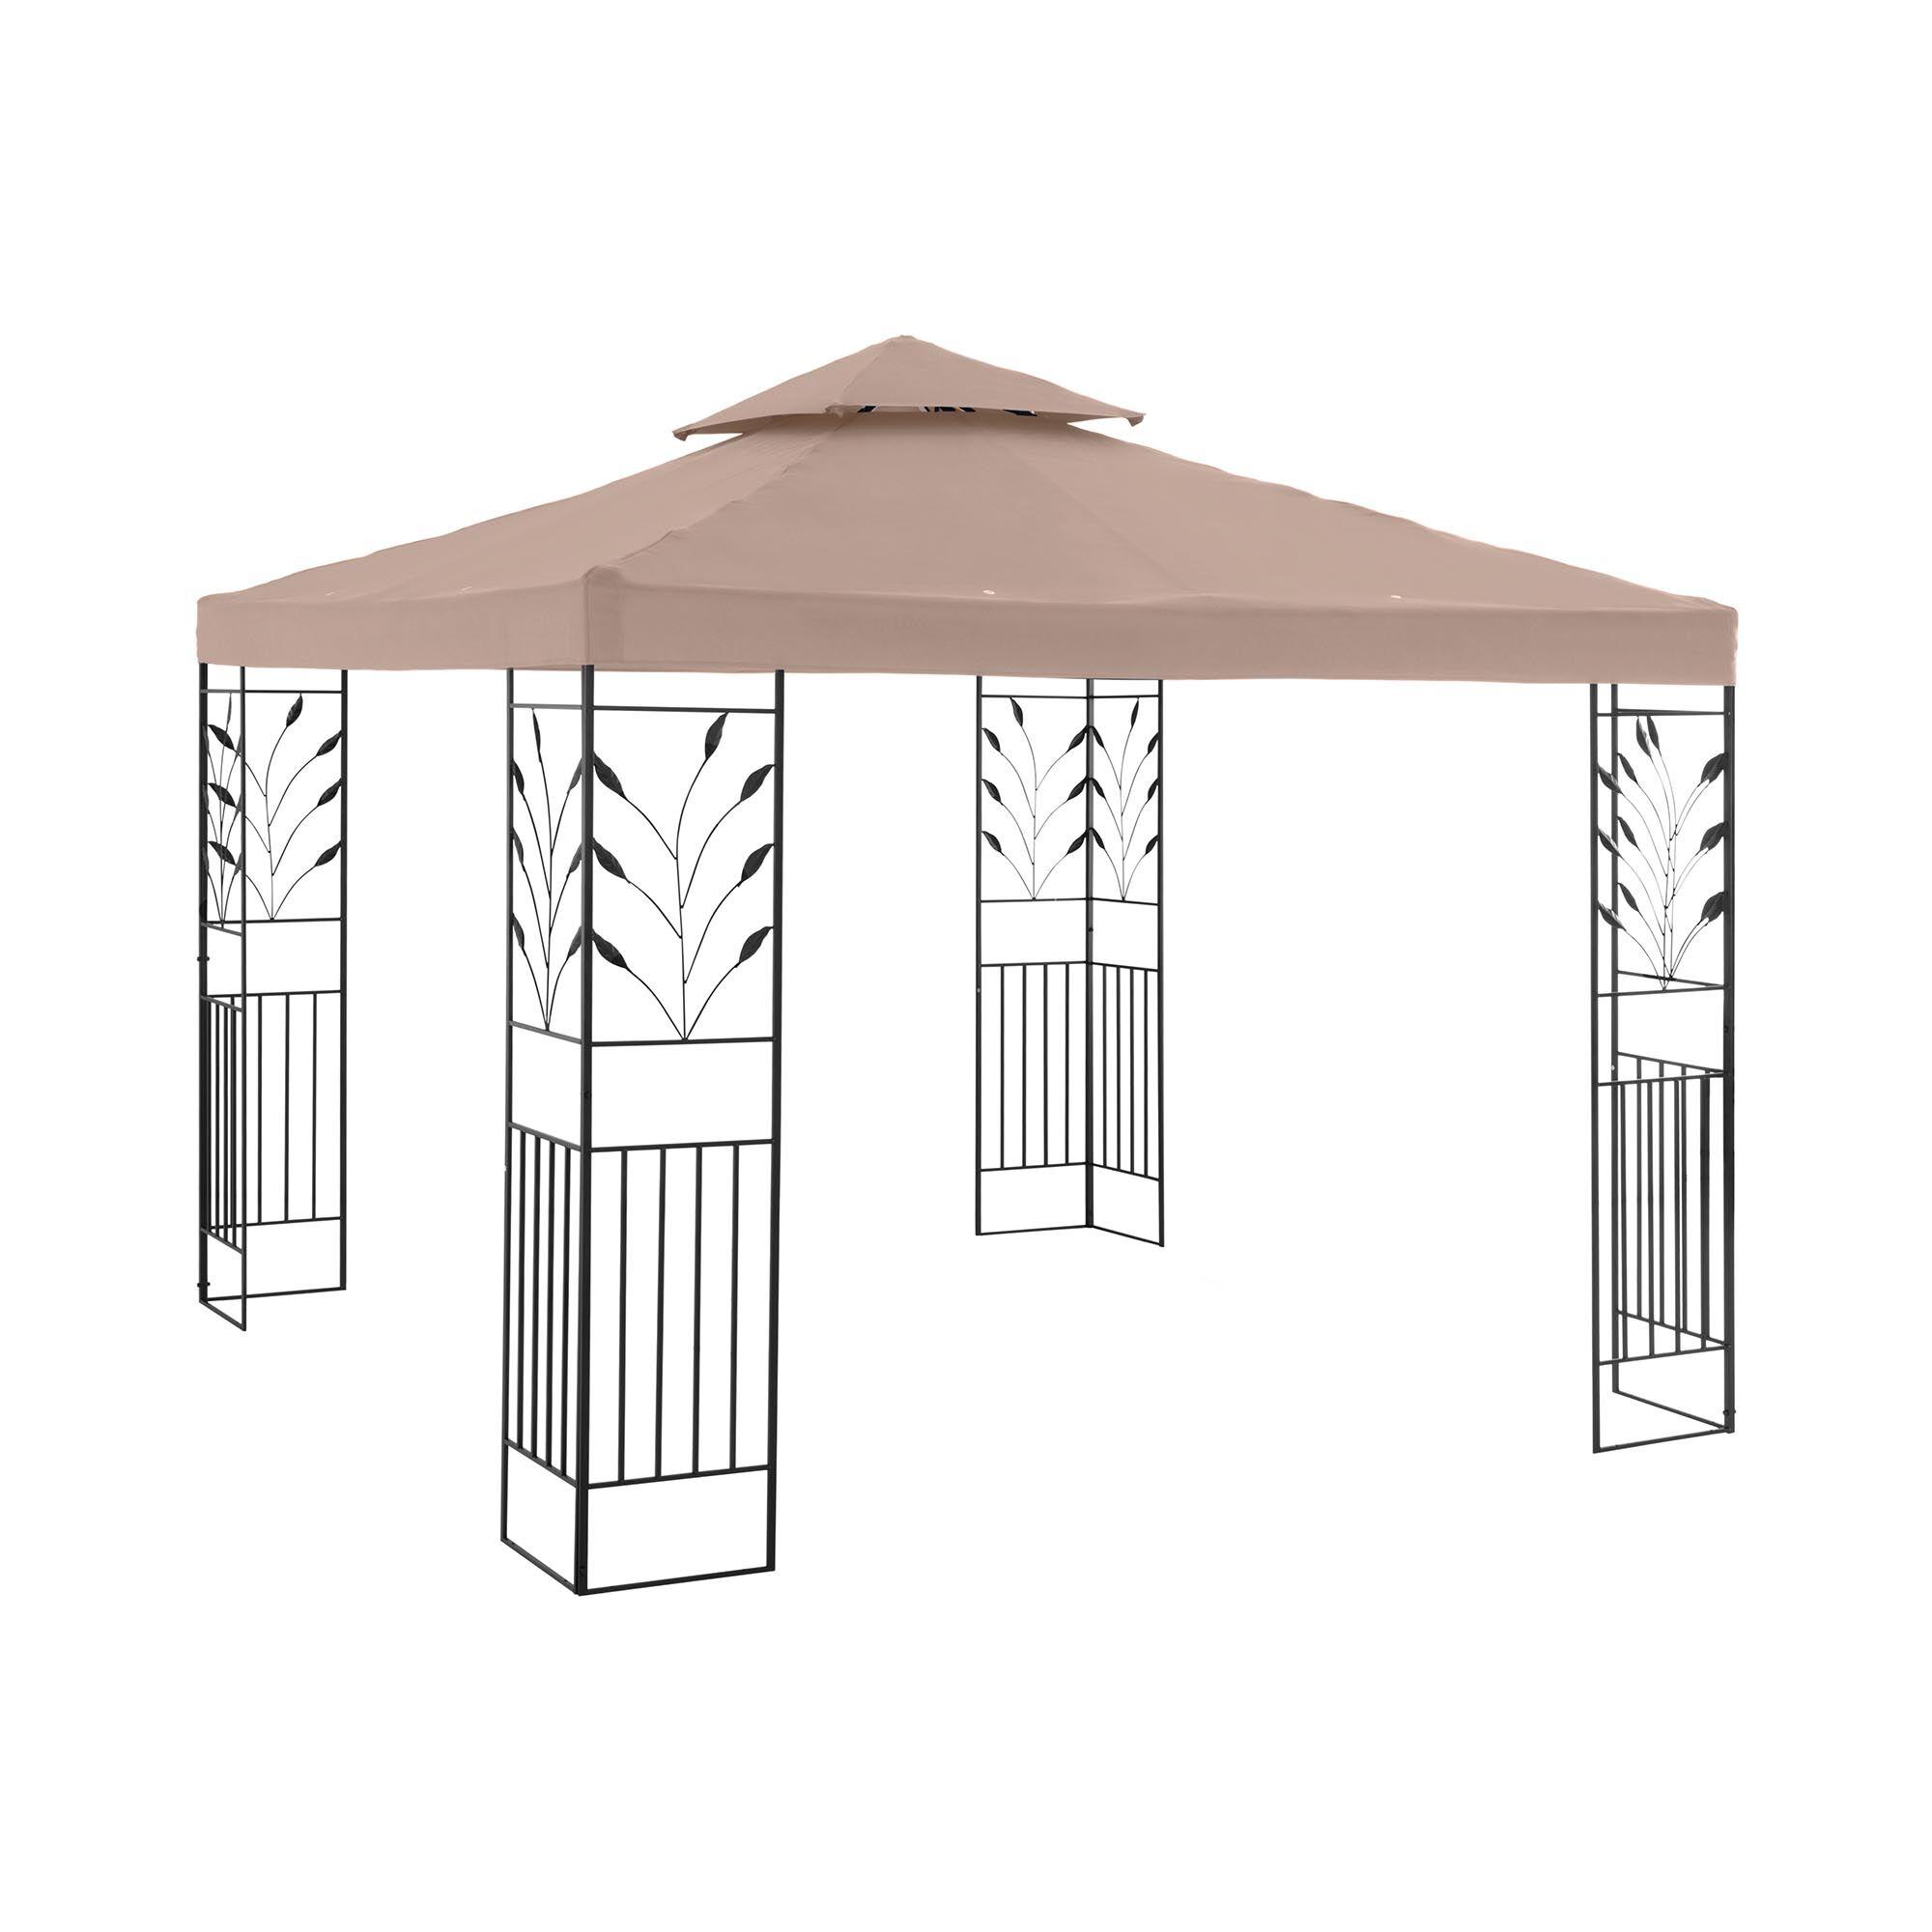 Uniprodo Garden Pavilion - 3 x 3 m - 180 g/m² - beige UNI_PERGOLA_3X3T_U